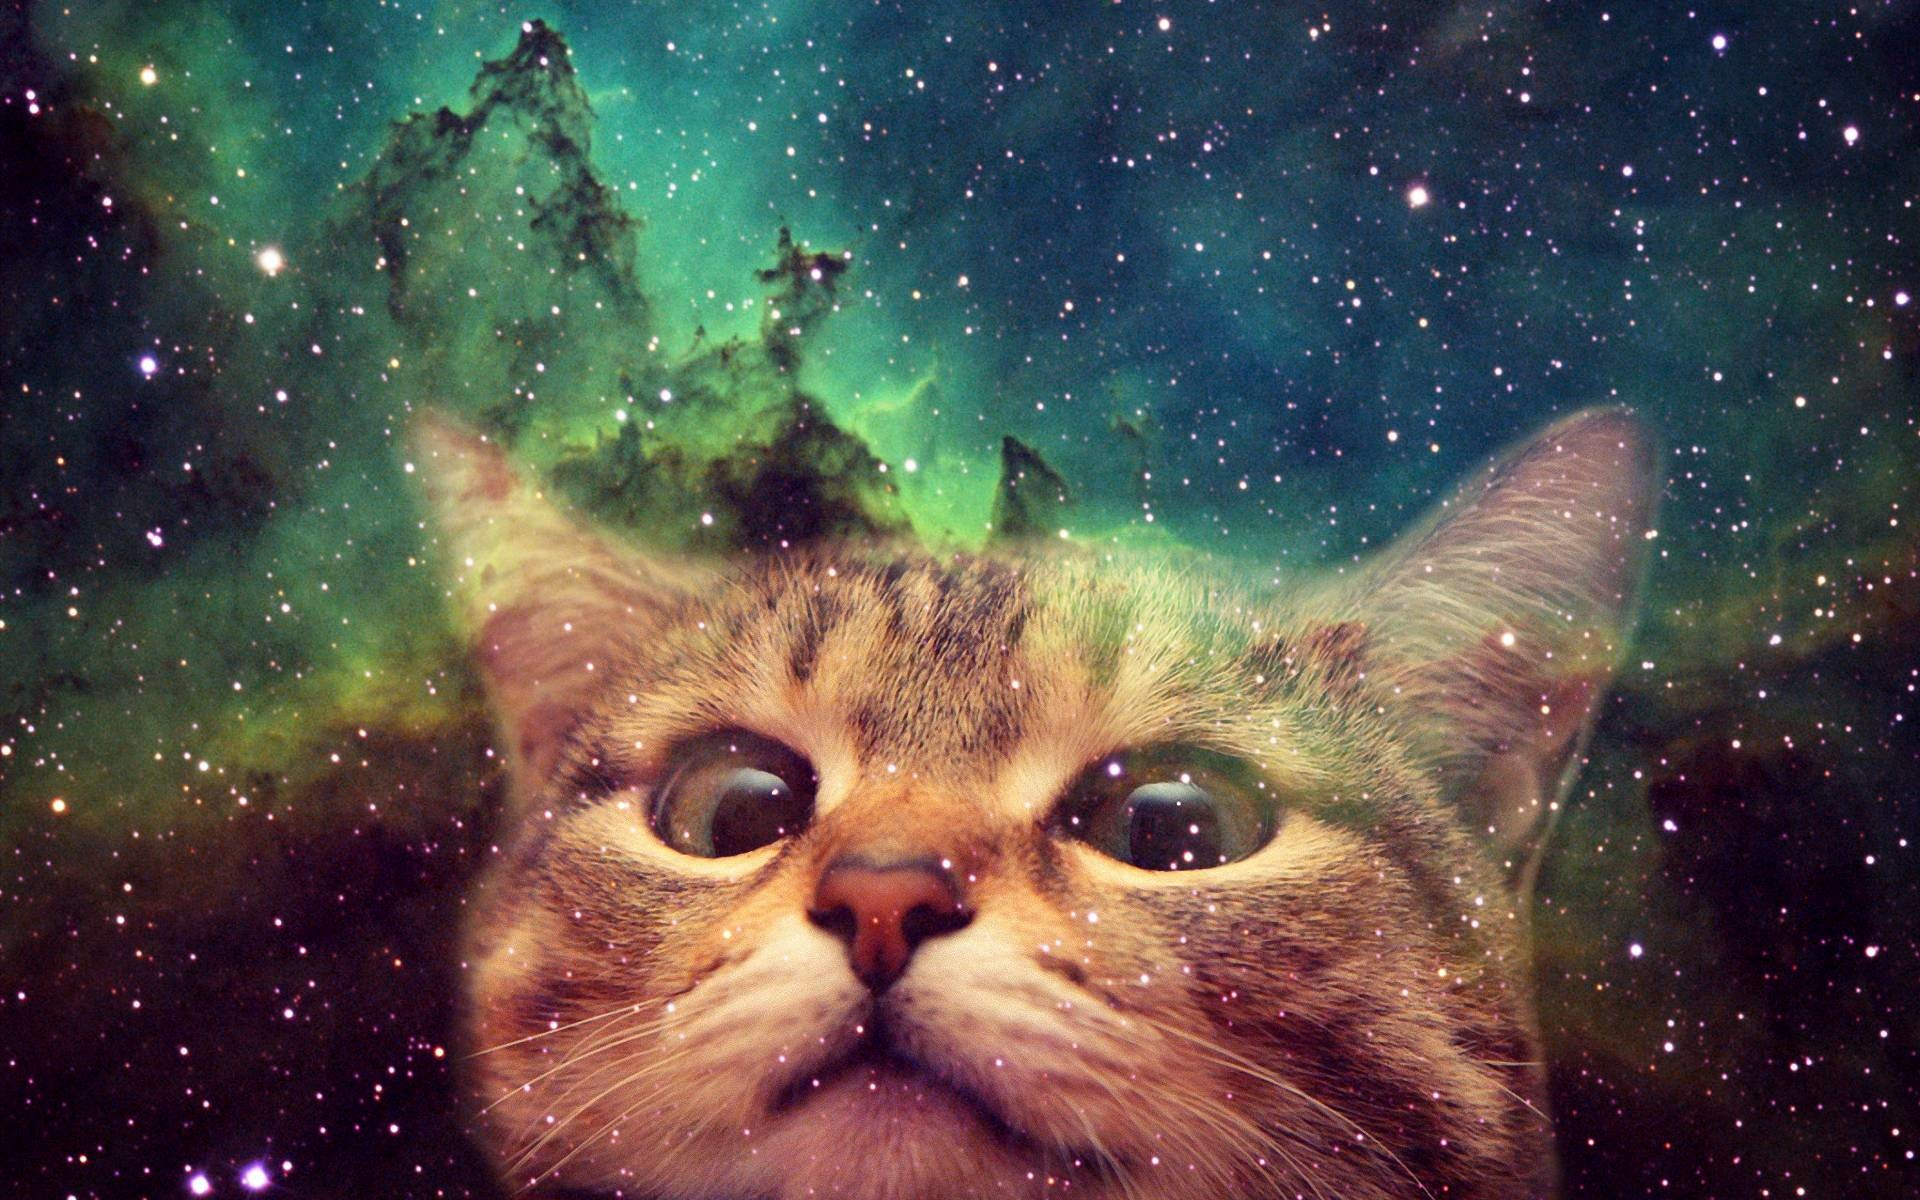 cat astronaut wallpaper (69+ images)